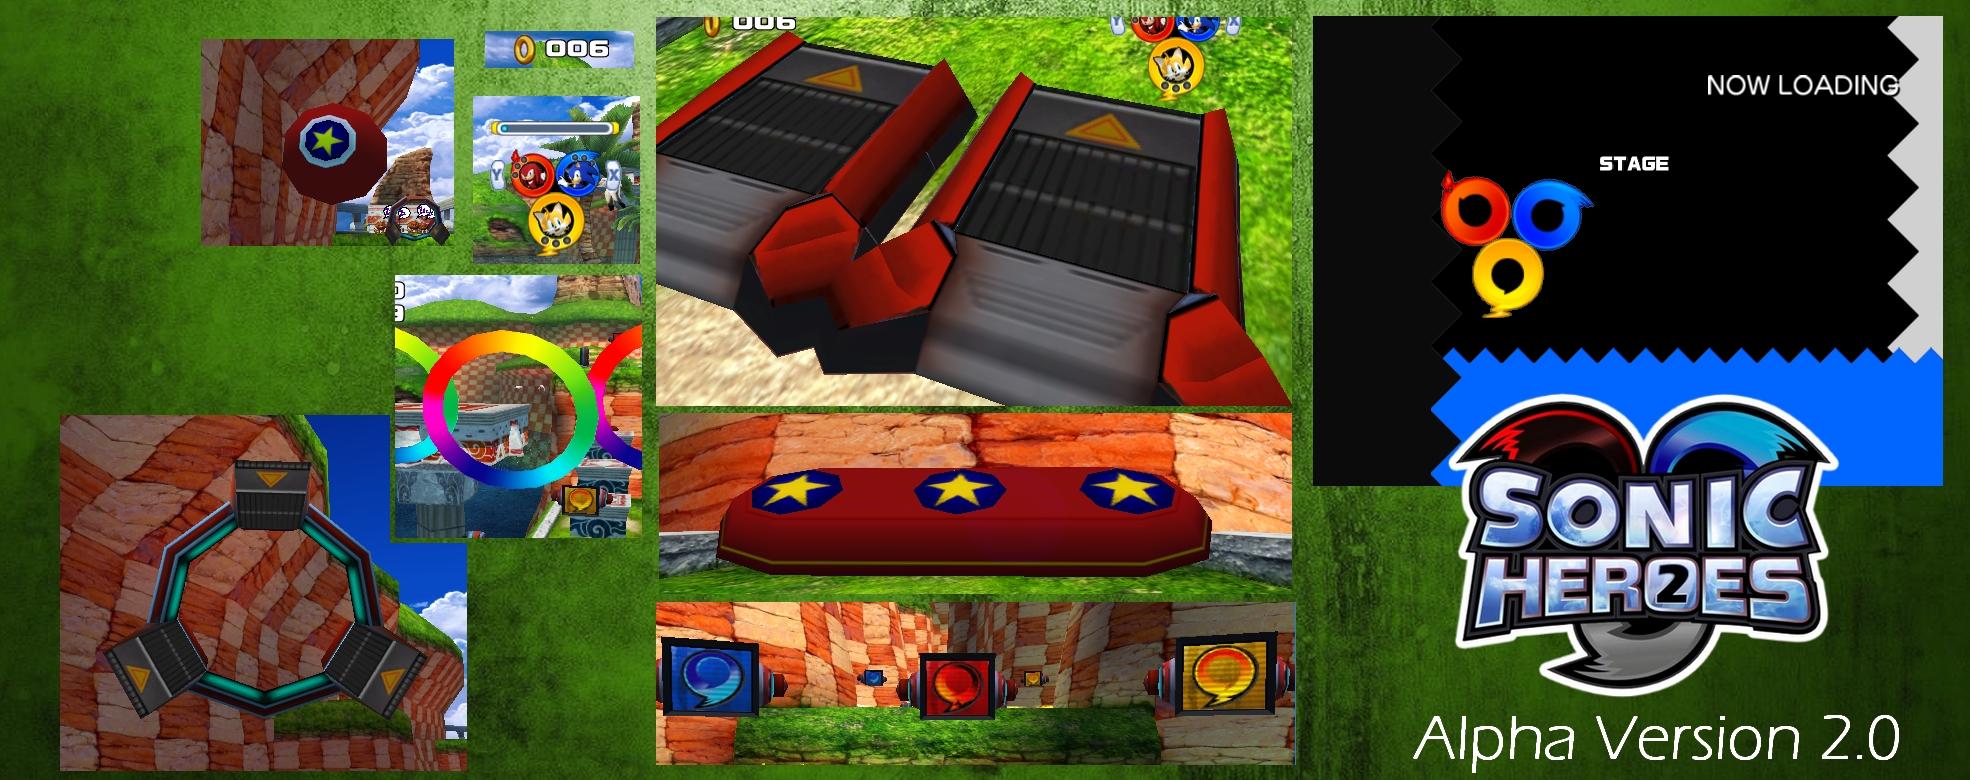 Sonic Heroes 2 - Alpha Version 2 0 addon - Mod DB